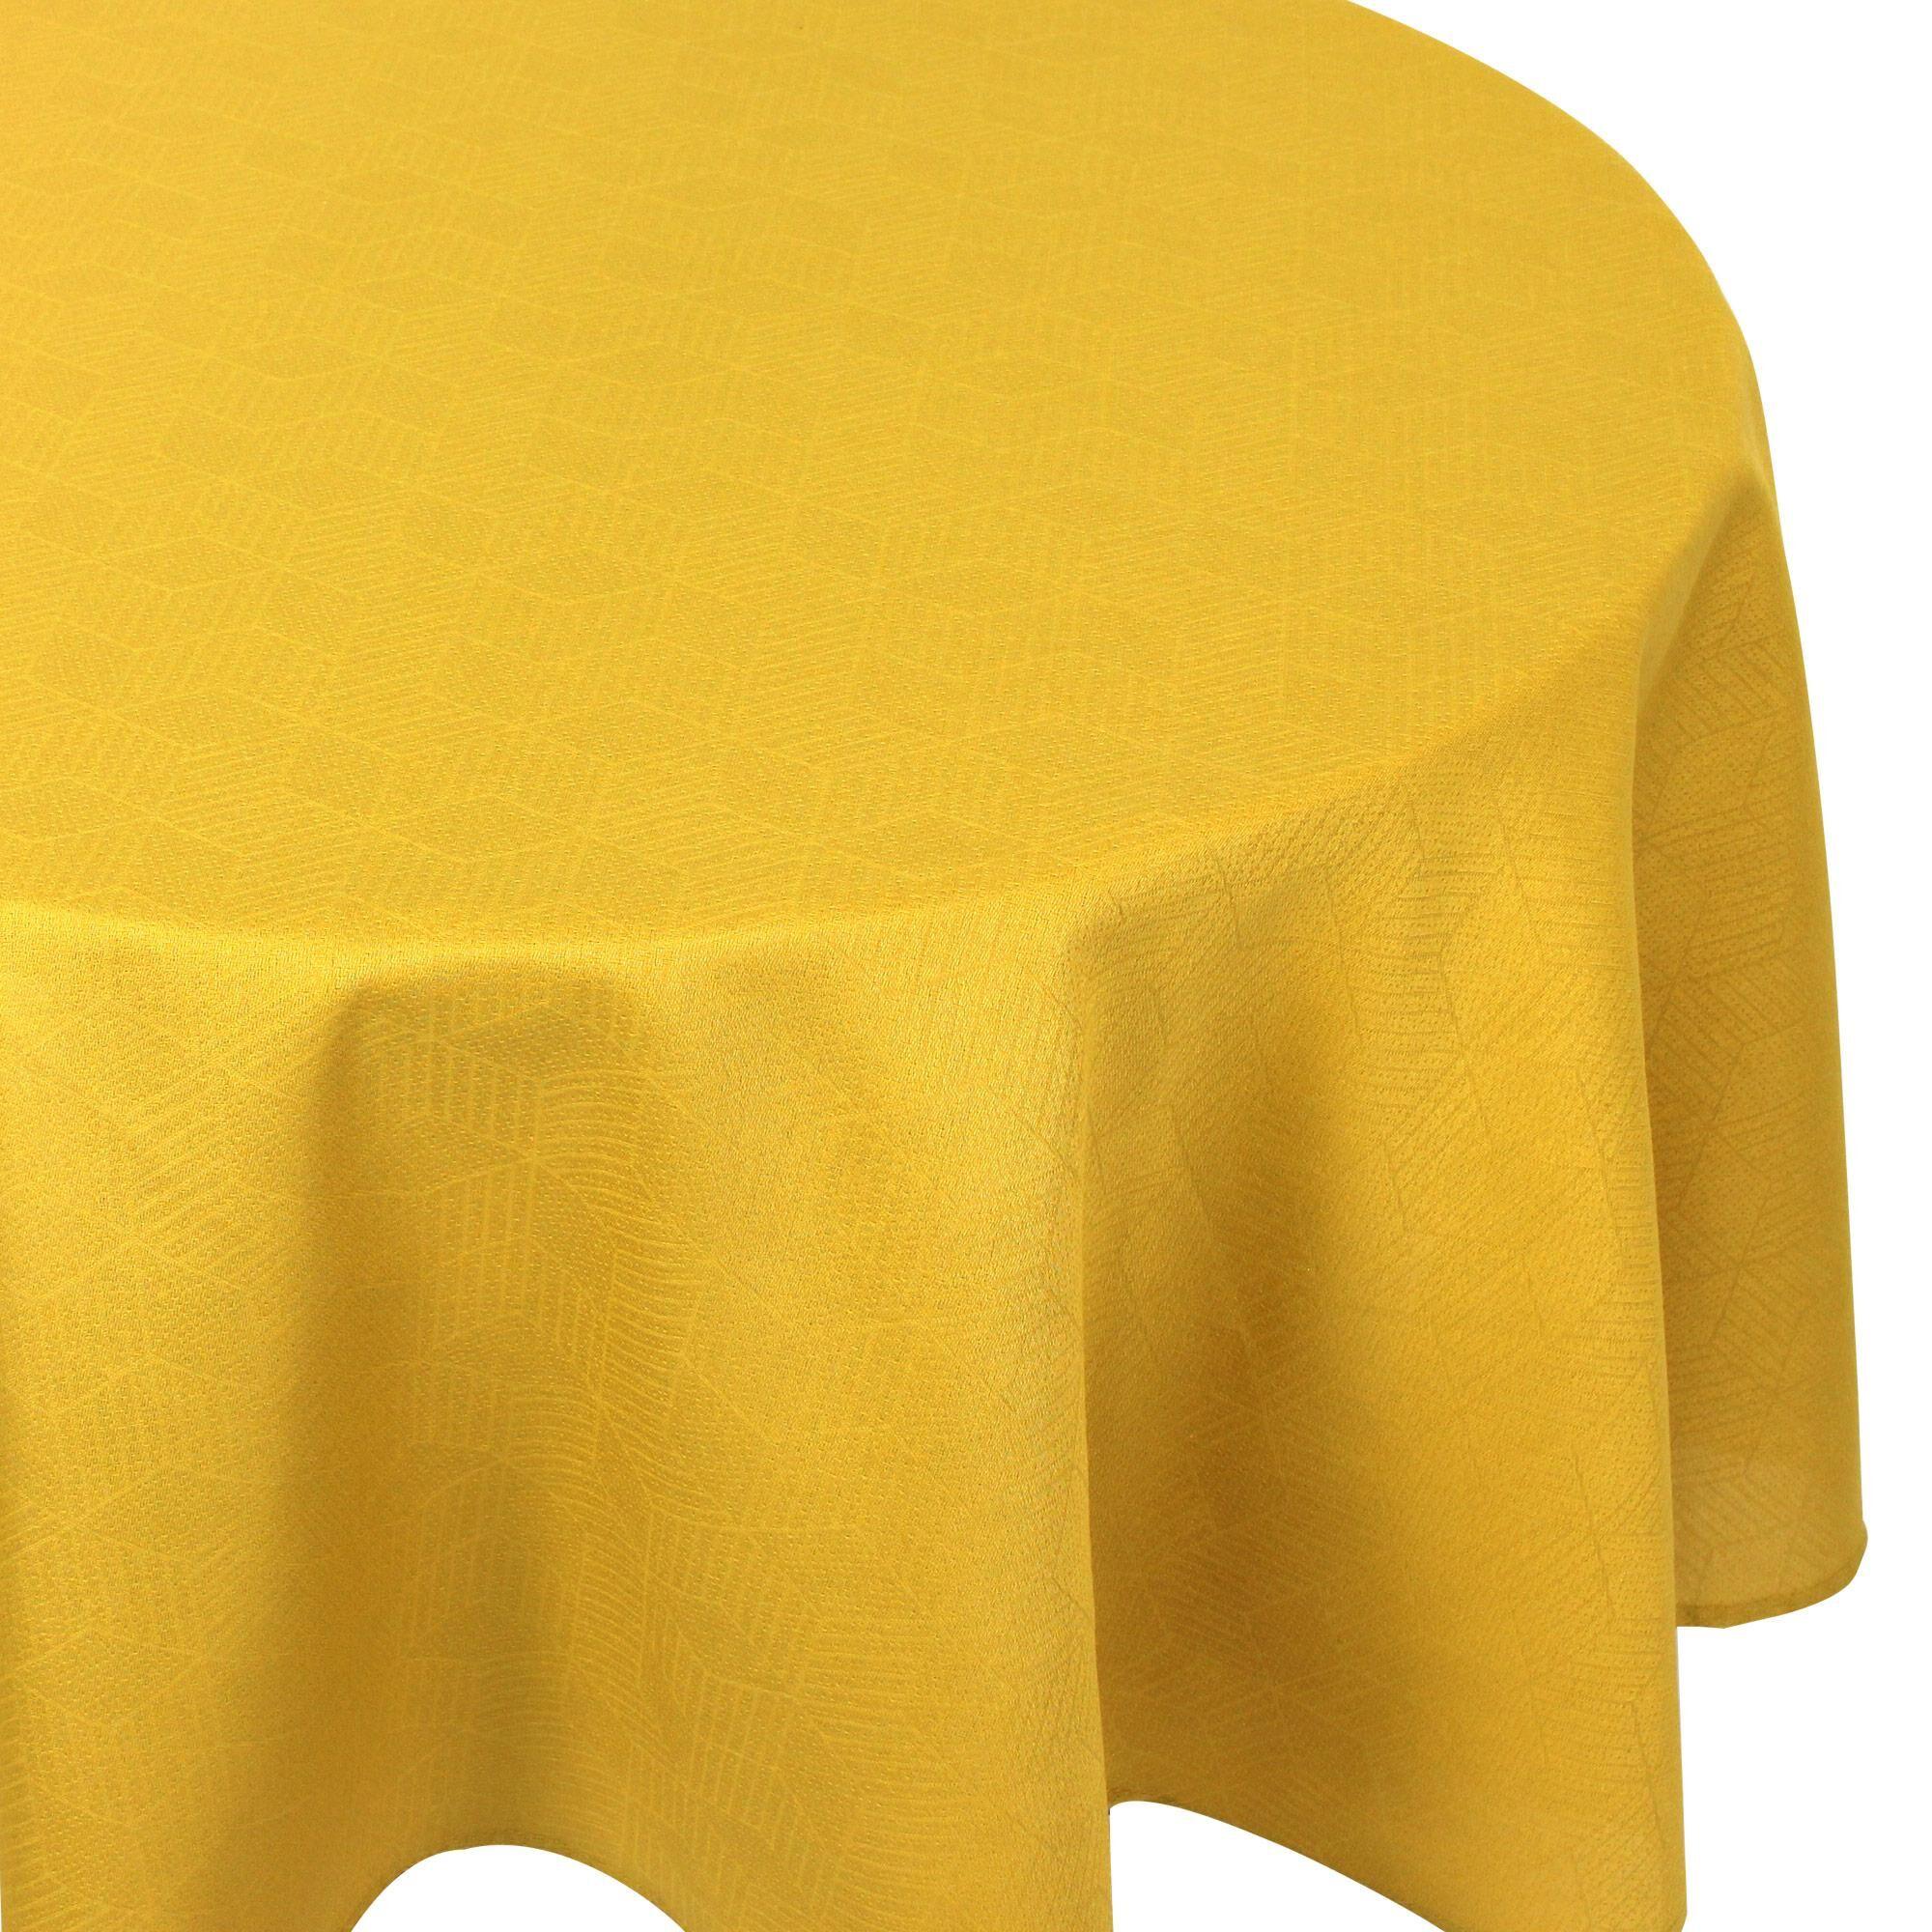 Linnea Nappe ronde 180 cm Jacquard 100% coton CUBE jaune Curcuma